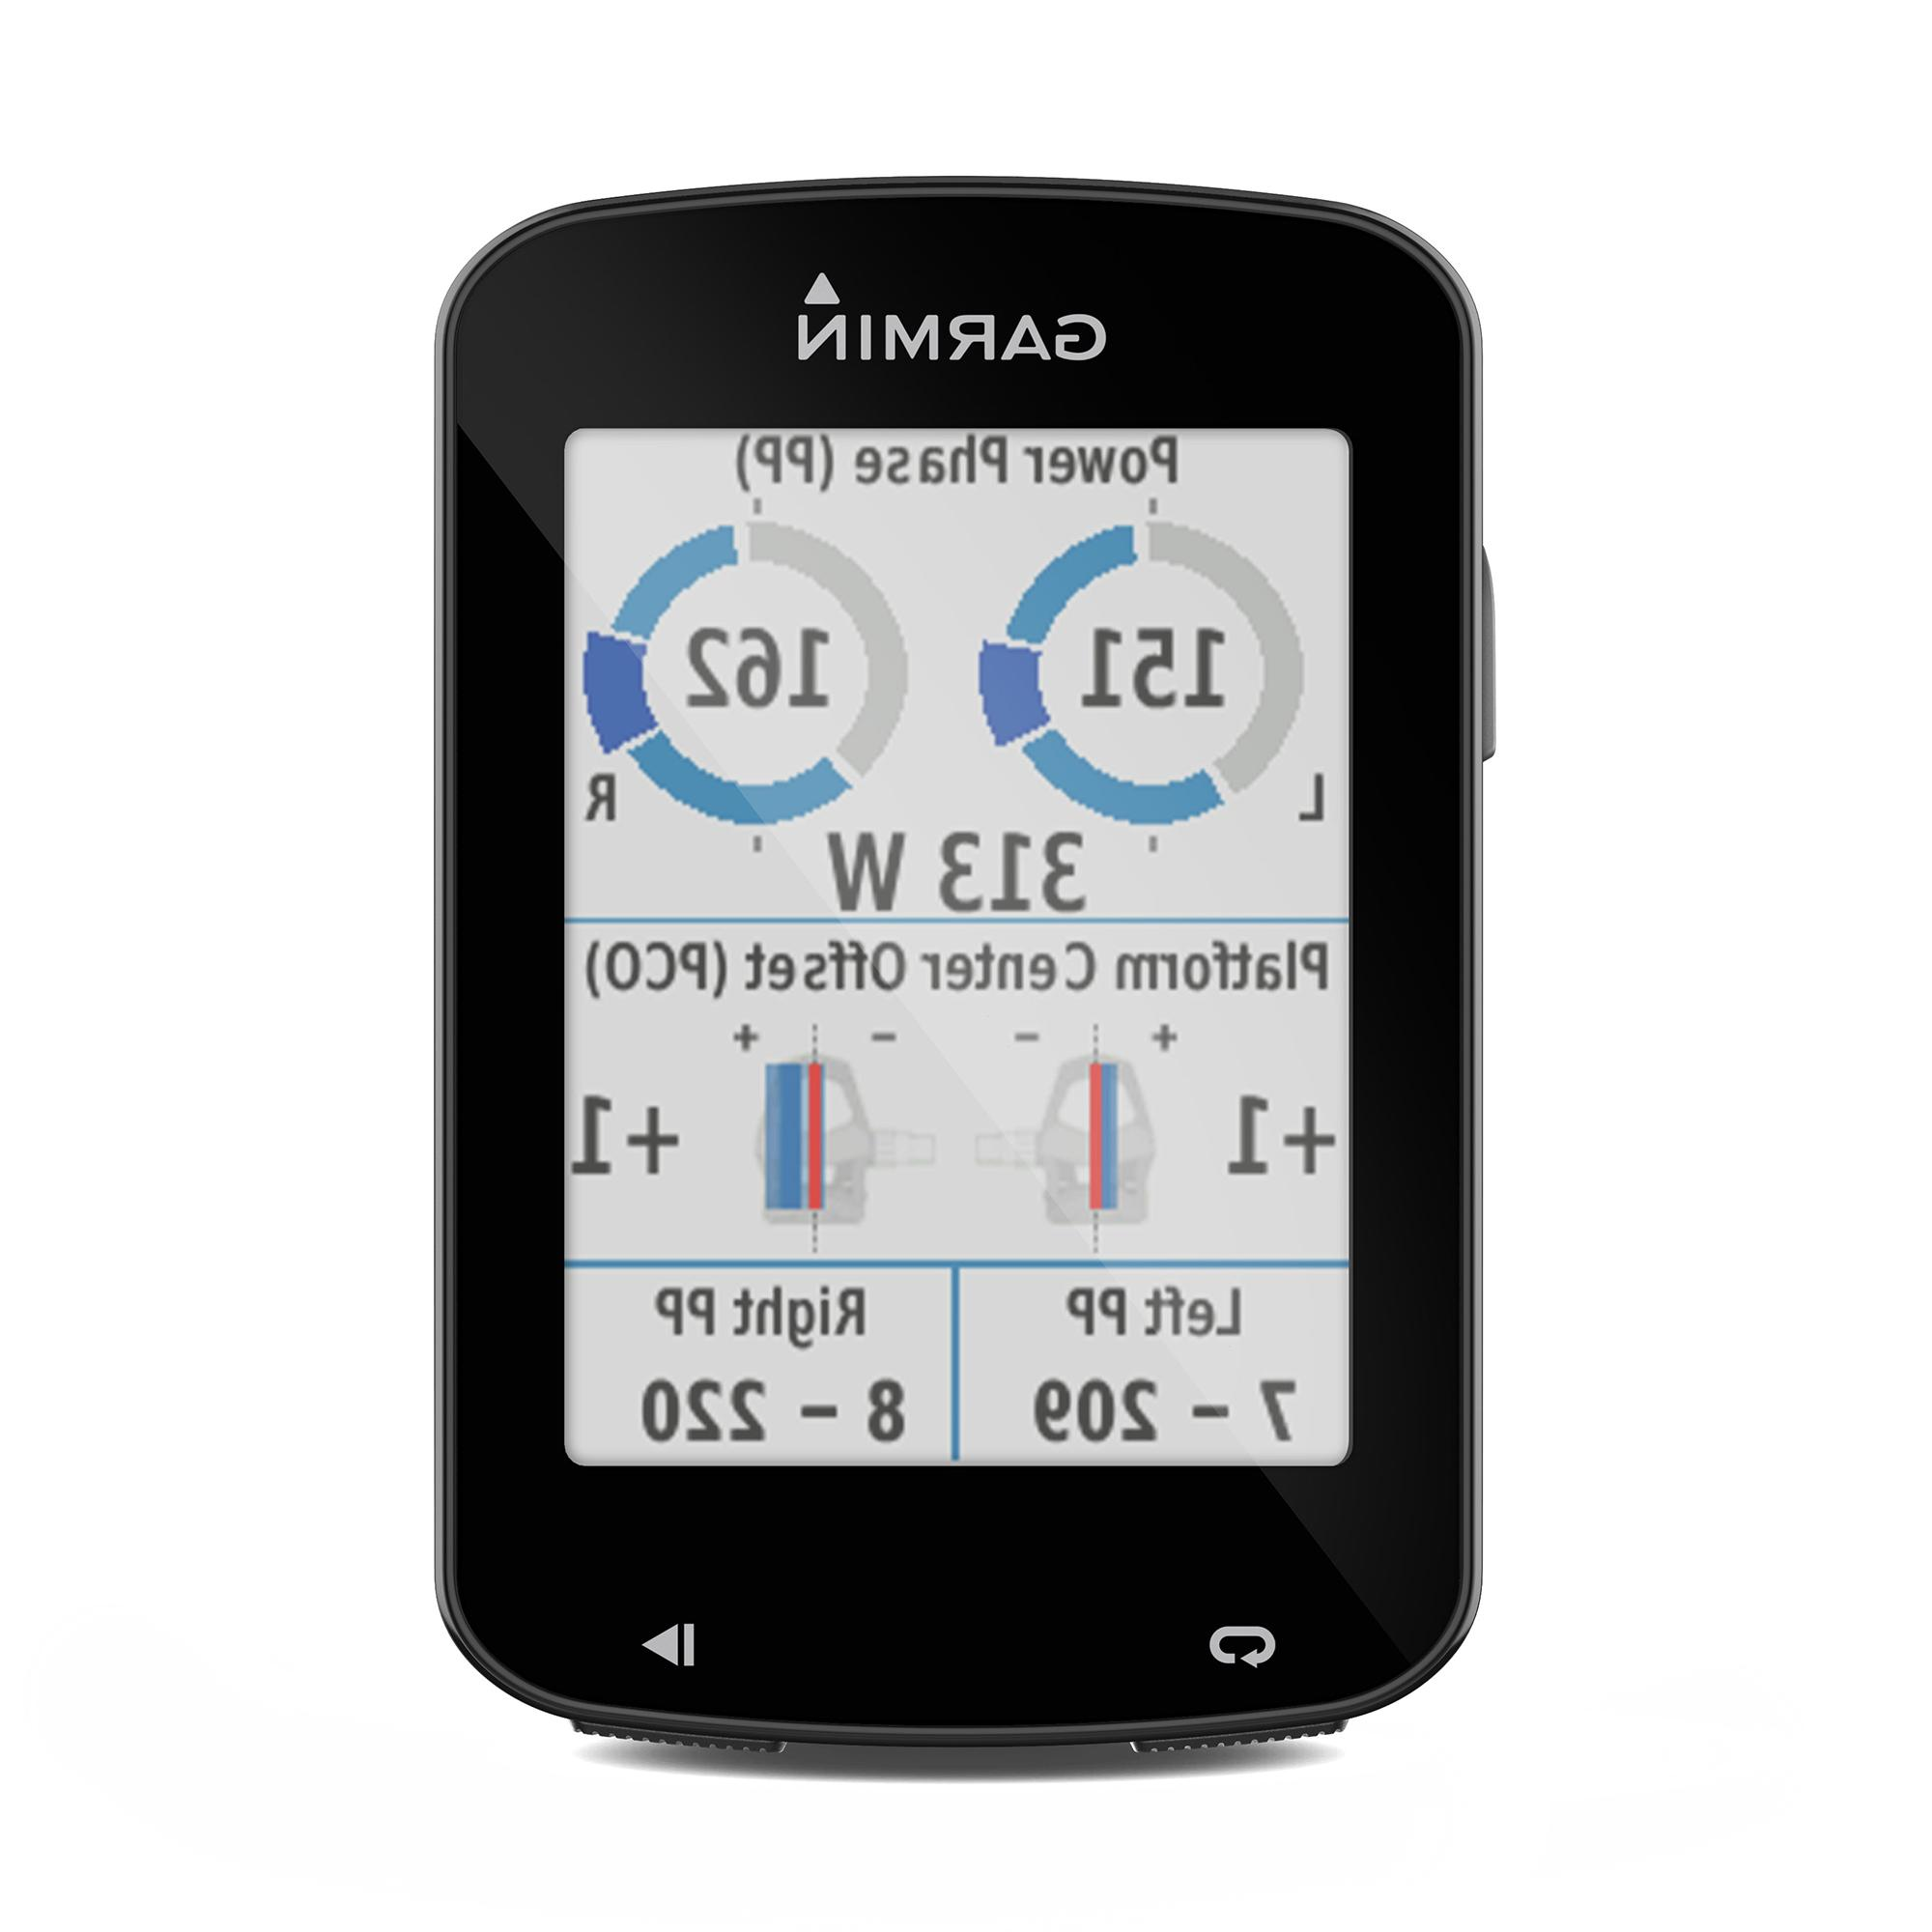 Garmin Edge 820 Advanced Performance Bike Cycling Computer G